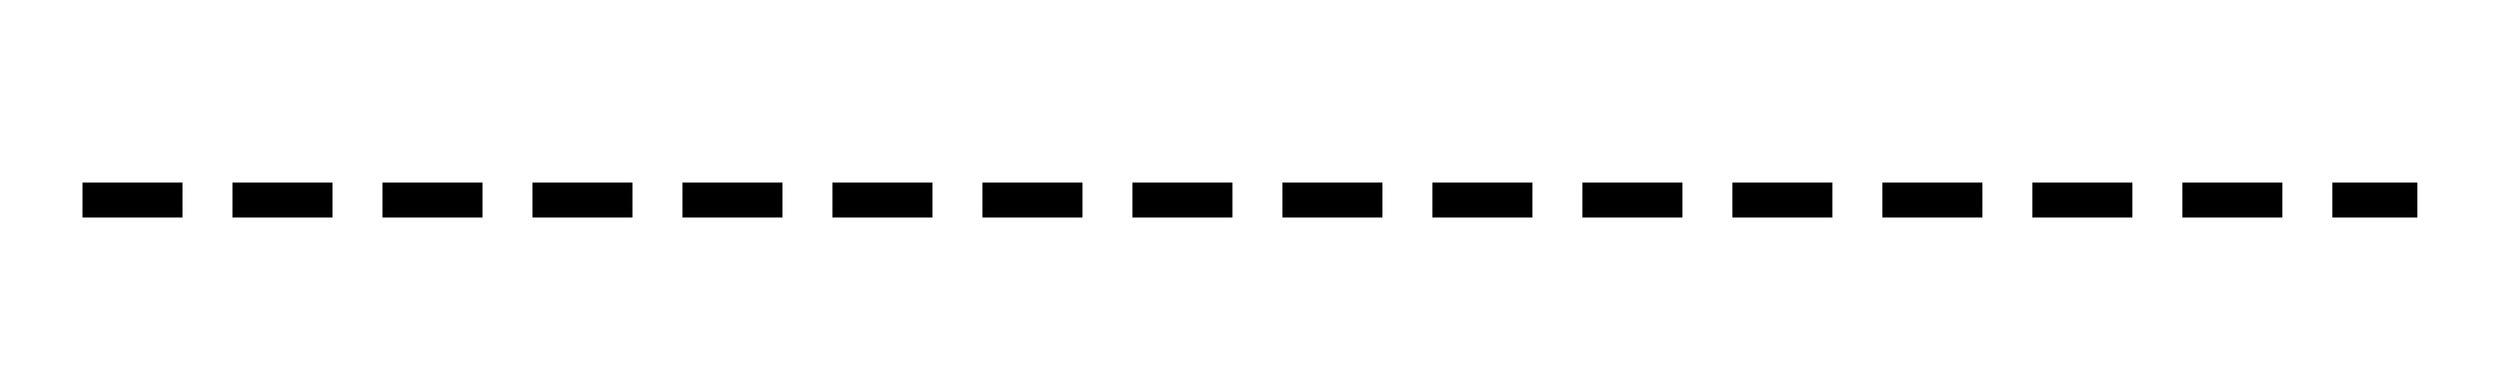 DividerLine-3-01.jpg